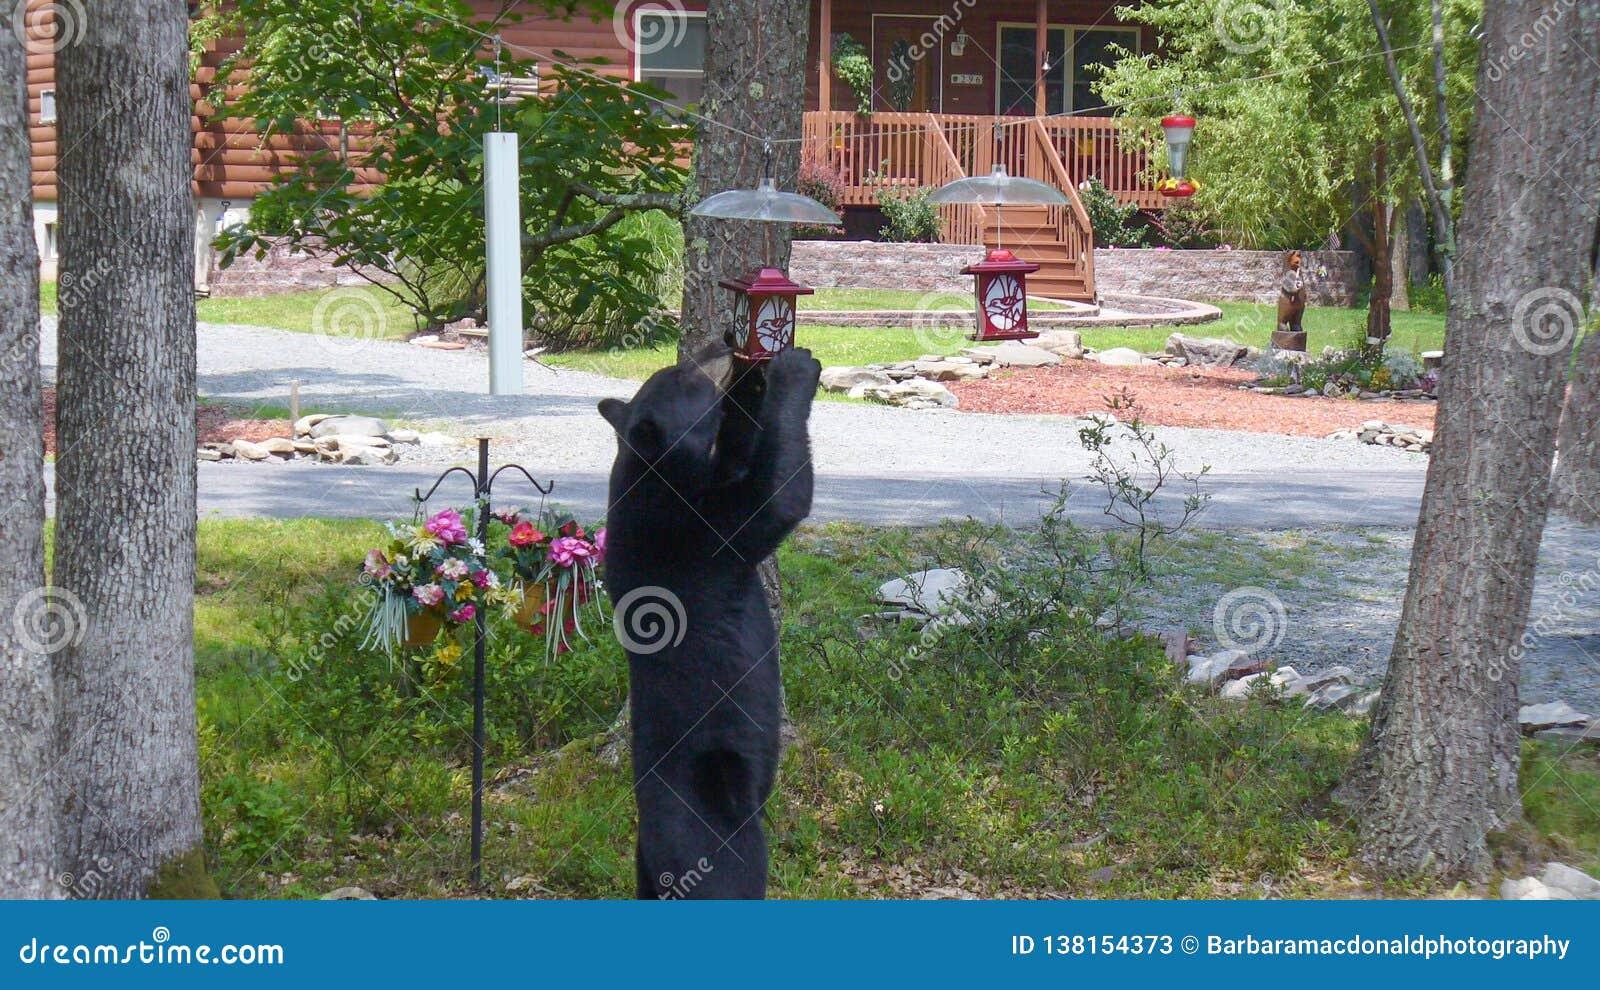 Black Bear Standing to Eat From a Bird Feeder